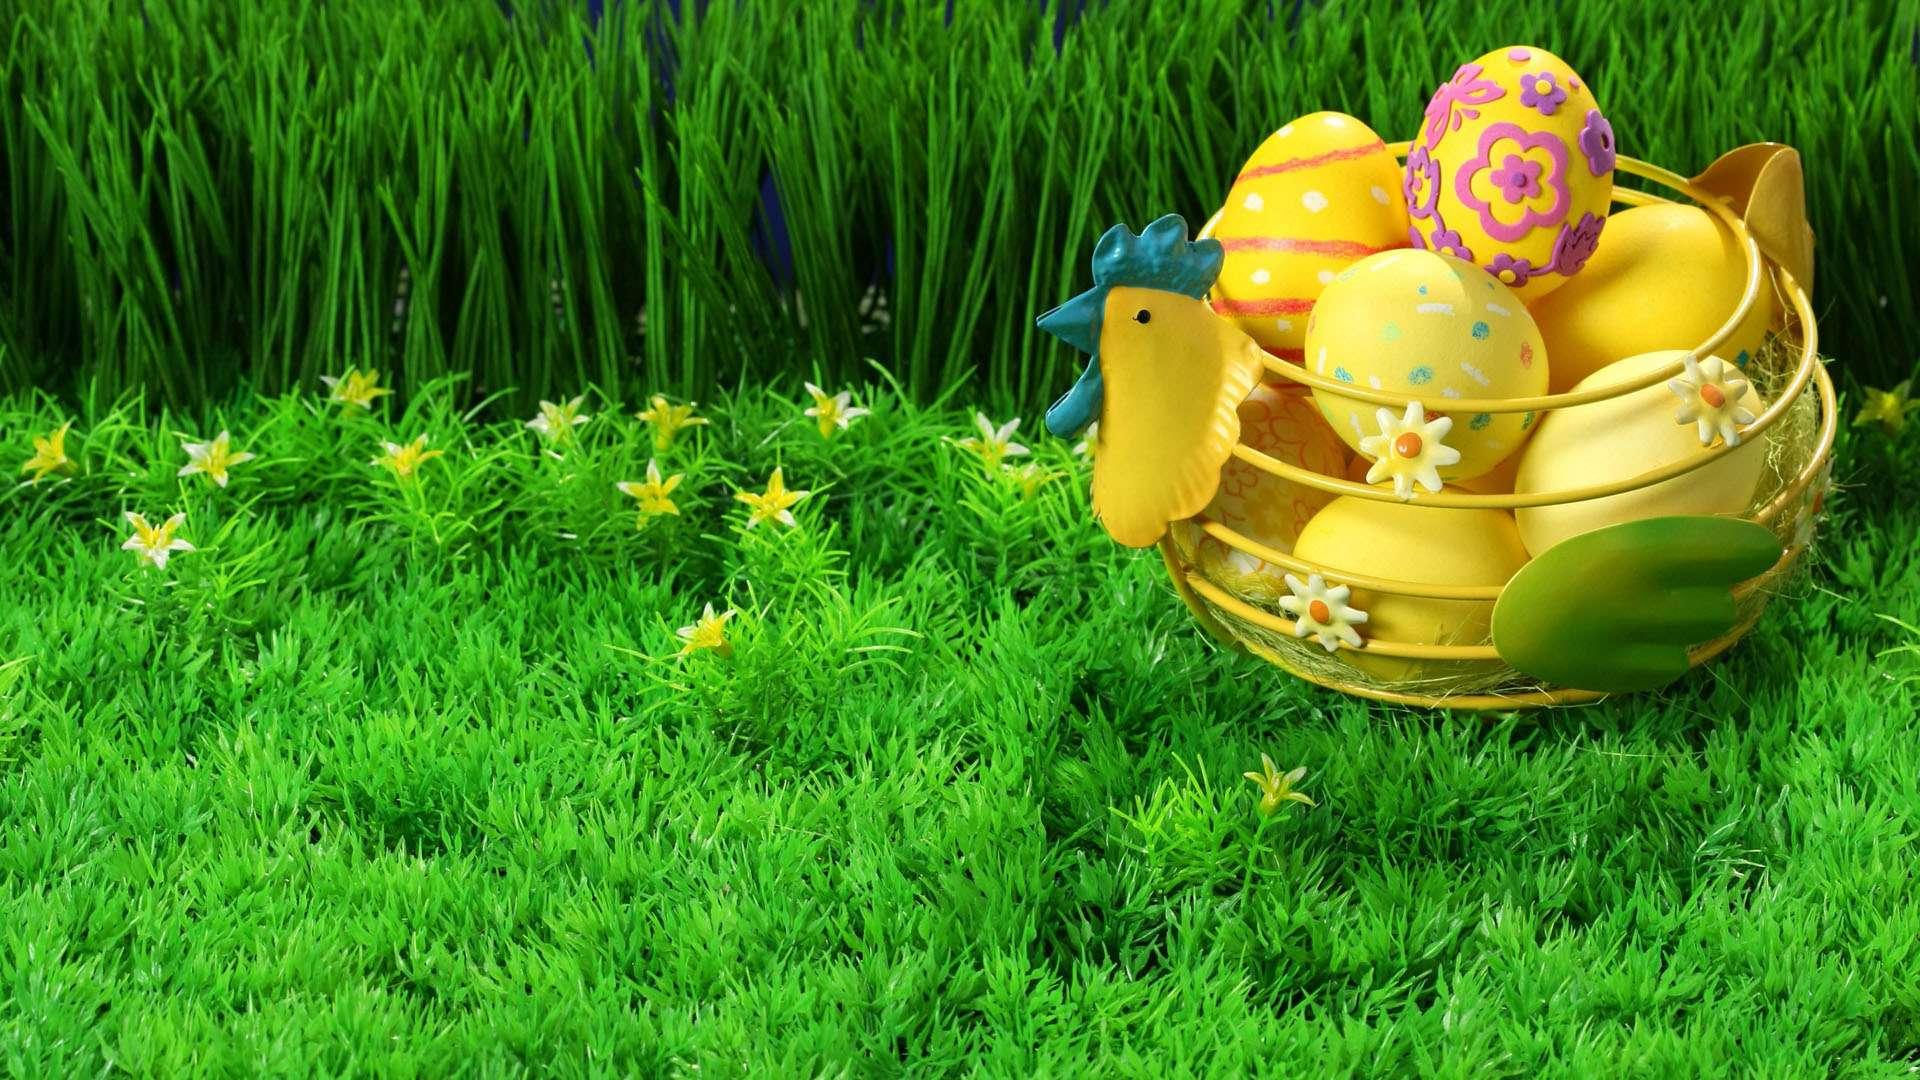 99 Easter Eggs Hd Wallpapers On Wallpapersafari